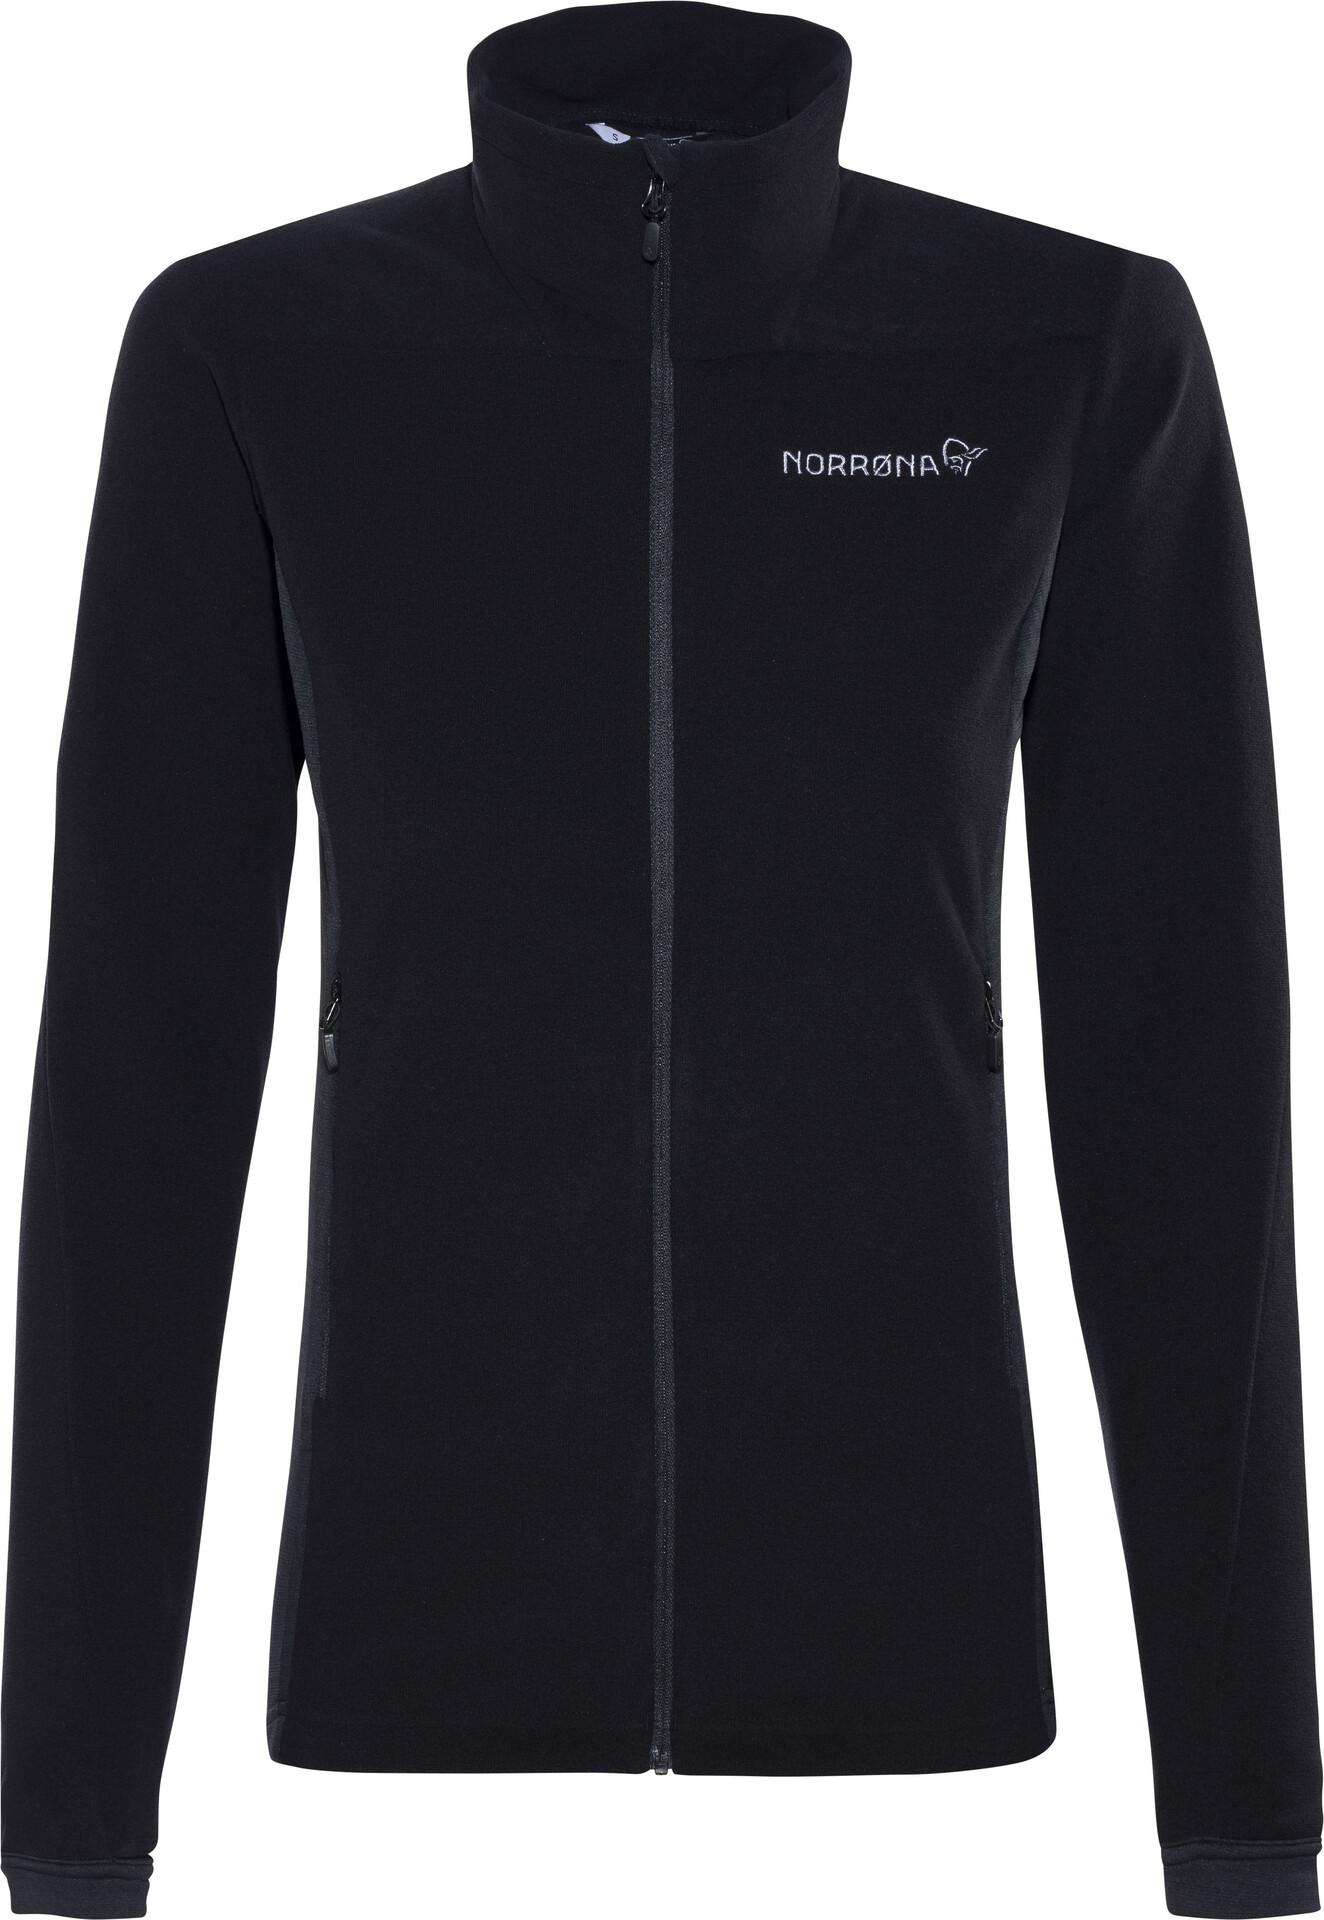 Norrøna Falketind Warm1 Jacket Damen caviar